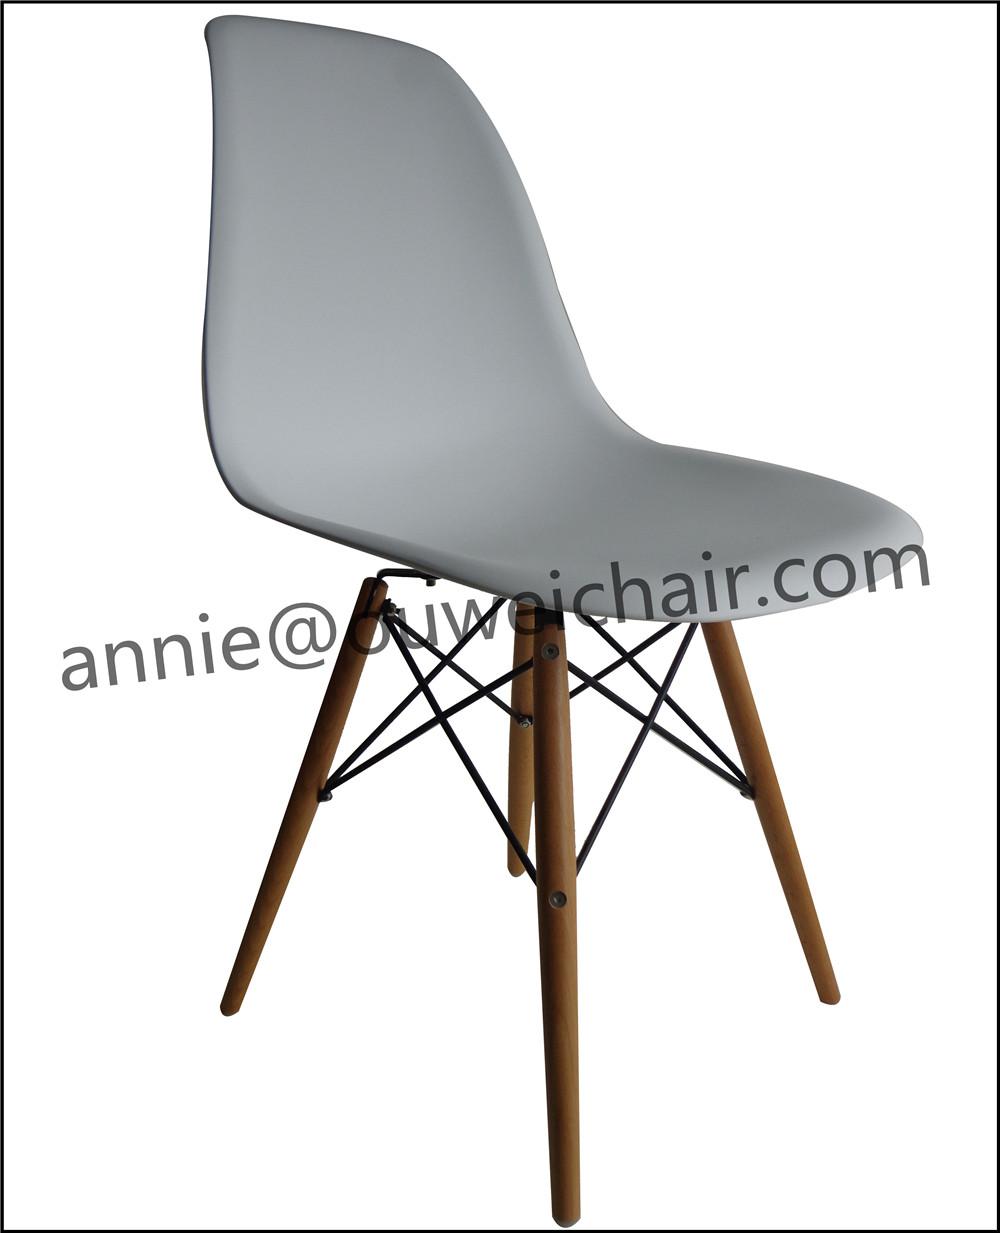 Emes chaise dsw ames chaise chaise jambe en bois bon for Dsw pas cher